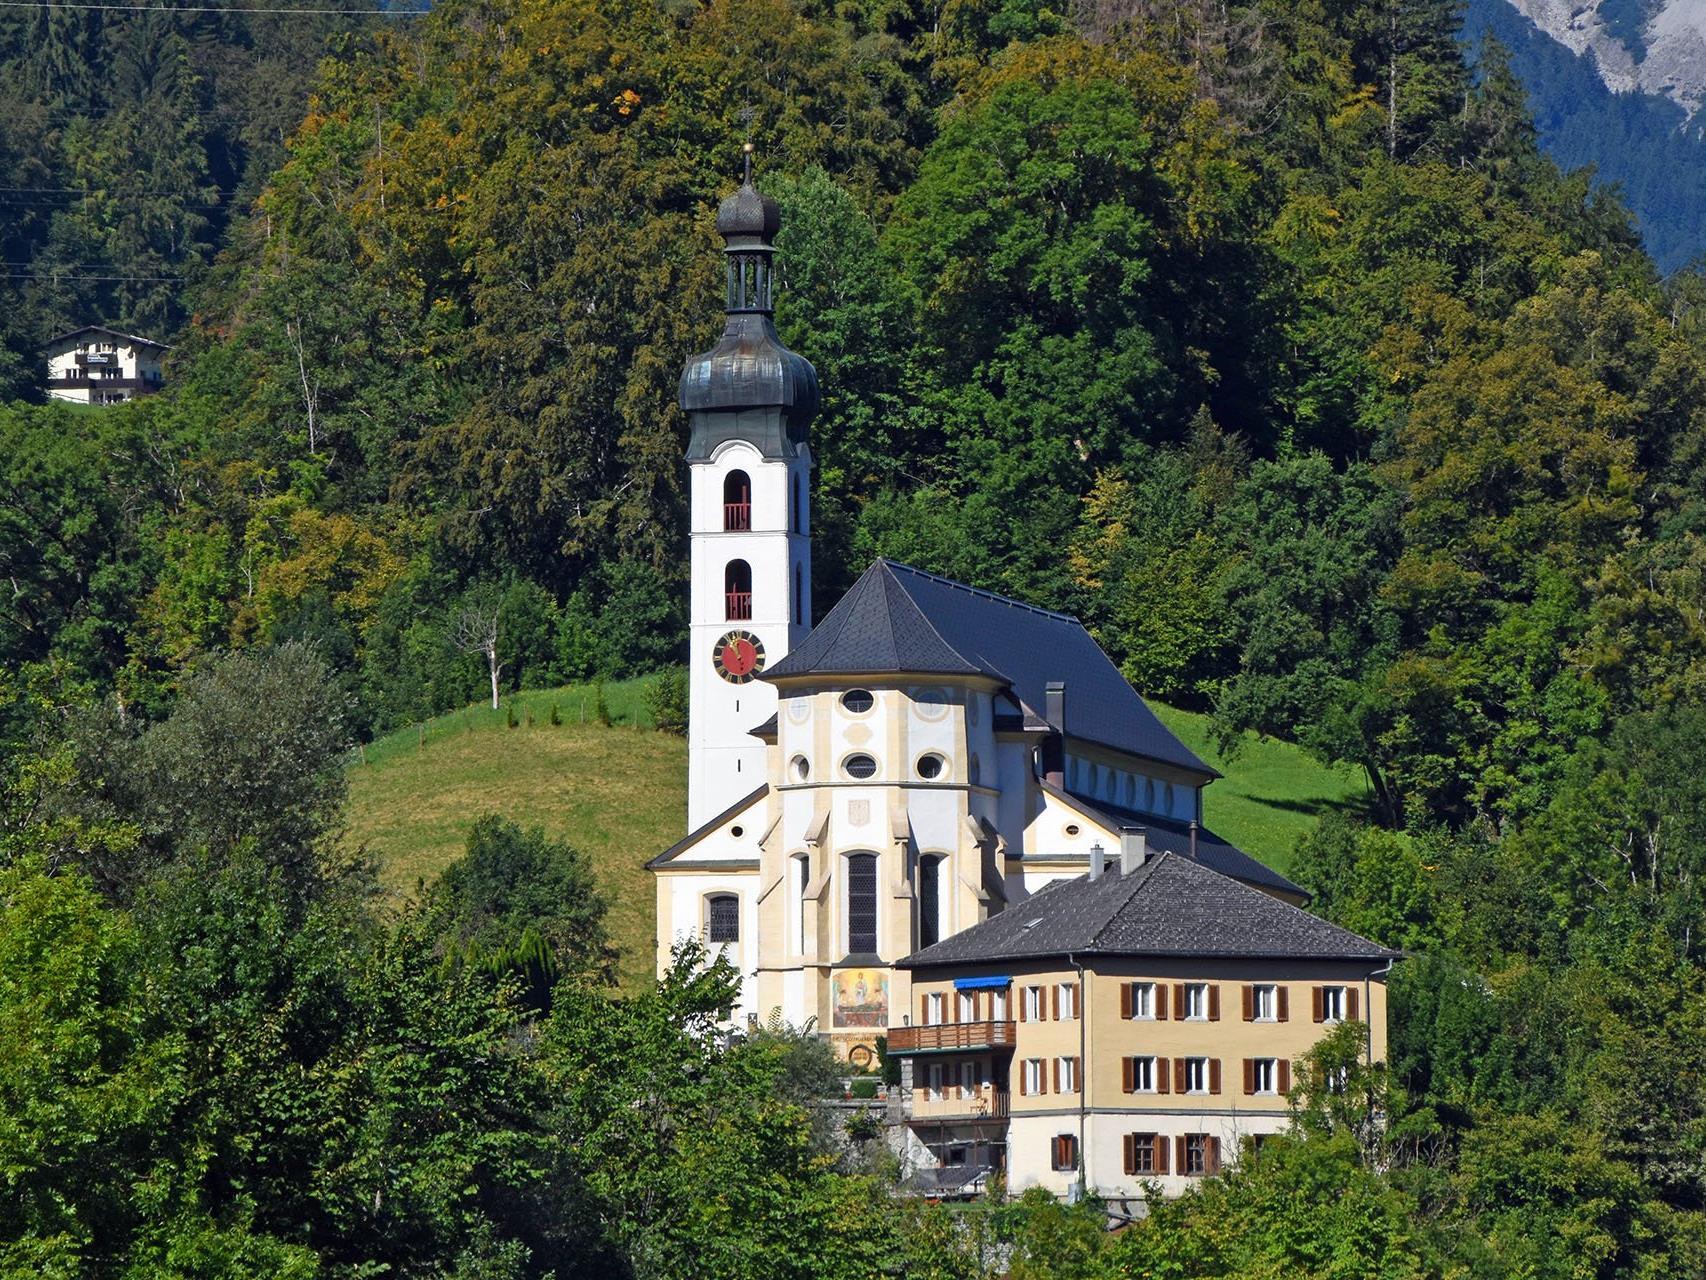 Pfarr- und Wallfahrtskirche Tschagguns